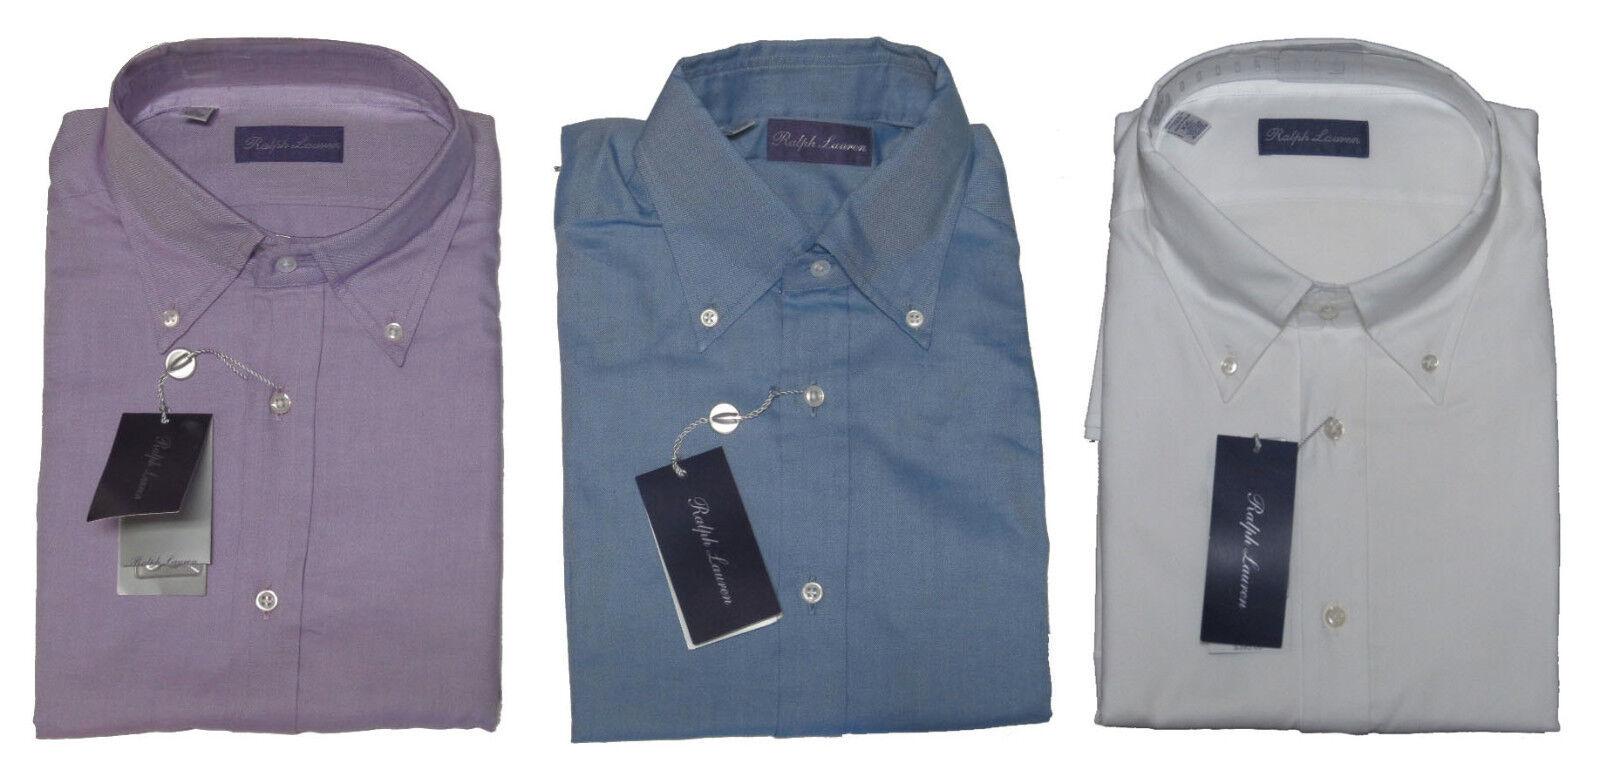 Ralph Lauren lila Label   Herren Button Down Solid Blau Weiß Dress Shirt